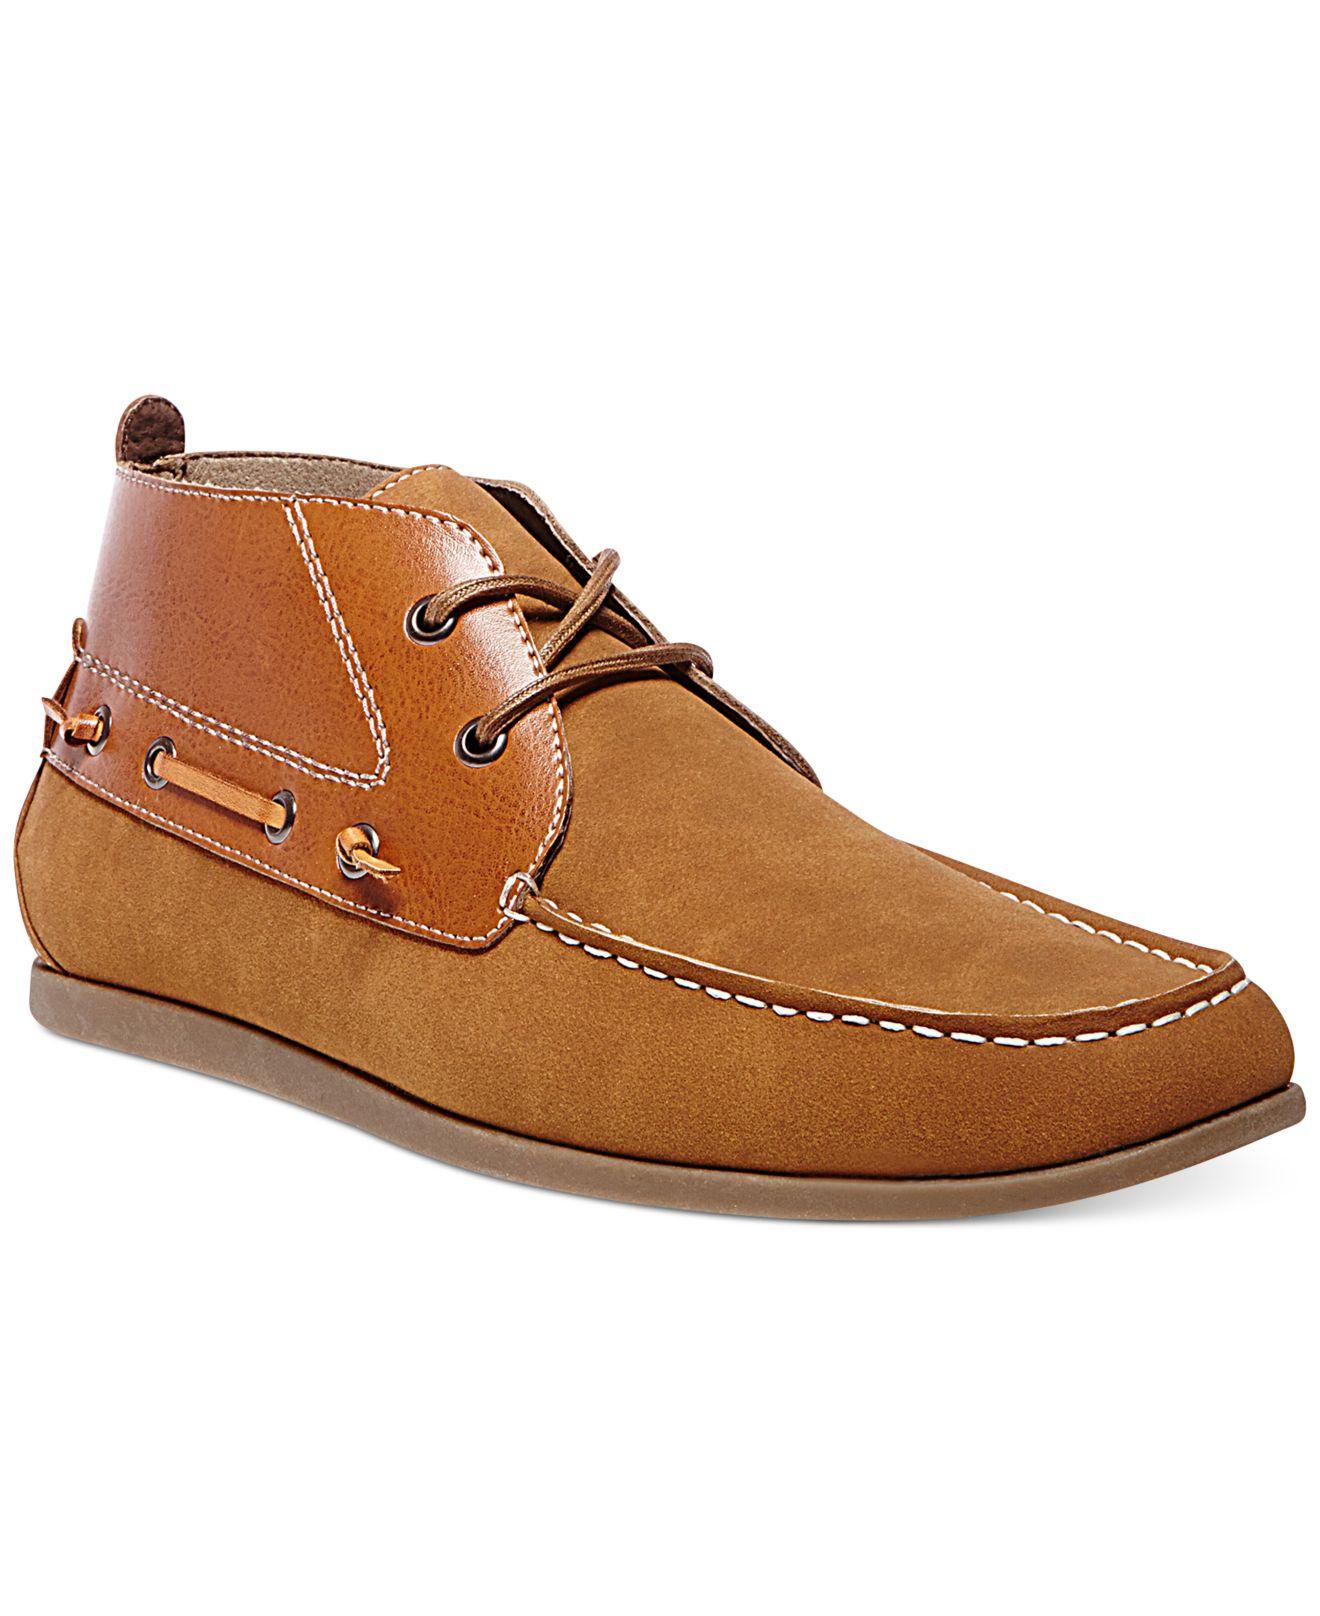 Steve Madden Madden Grotto Chukka Boots In Brown For Men